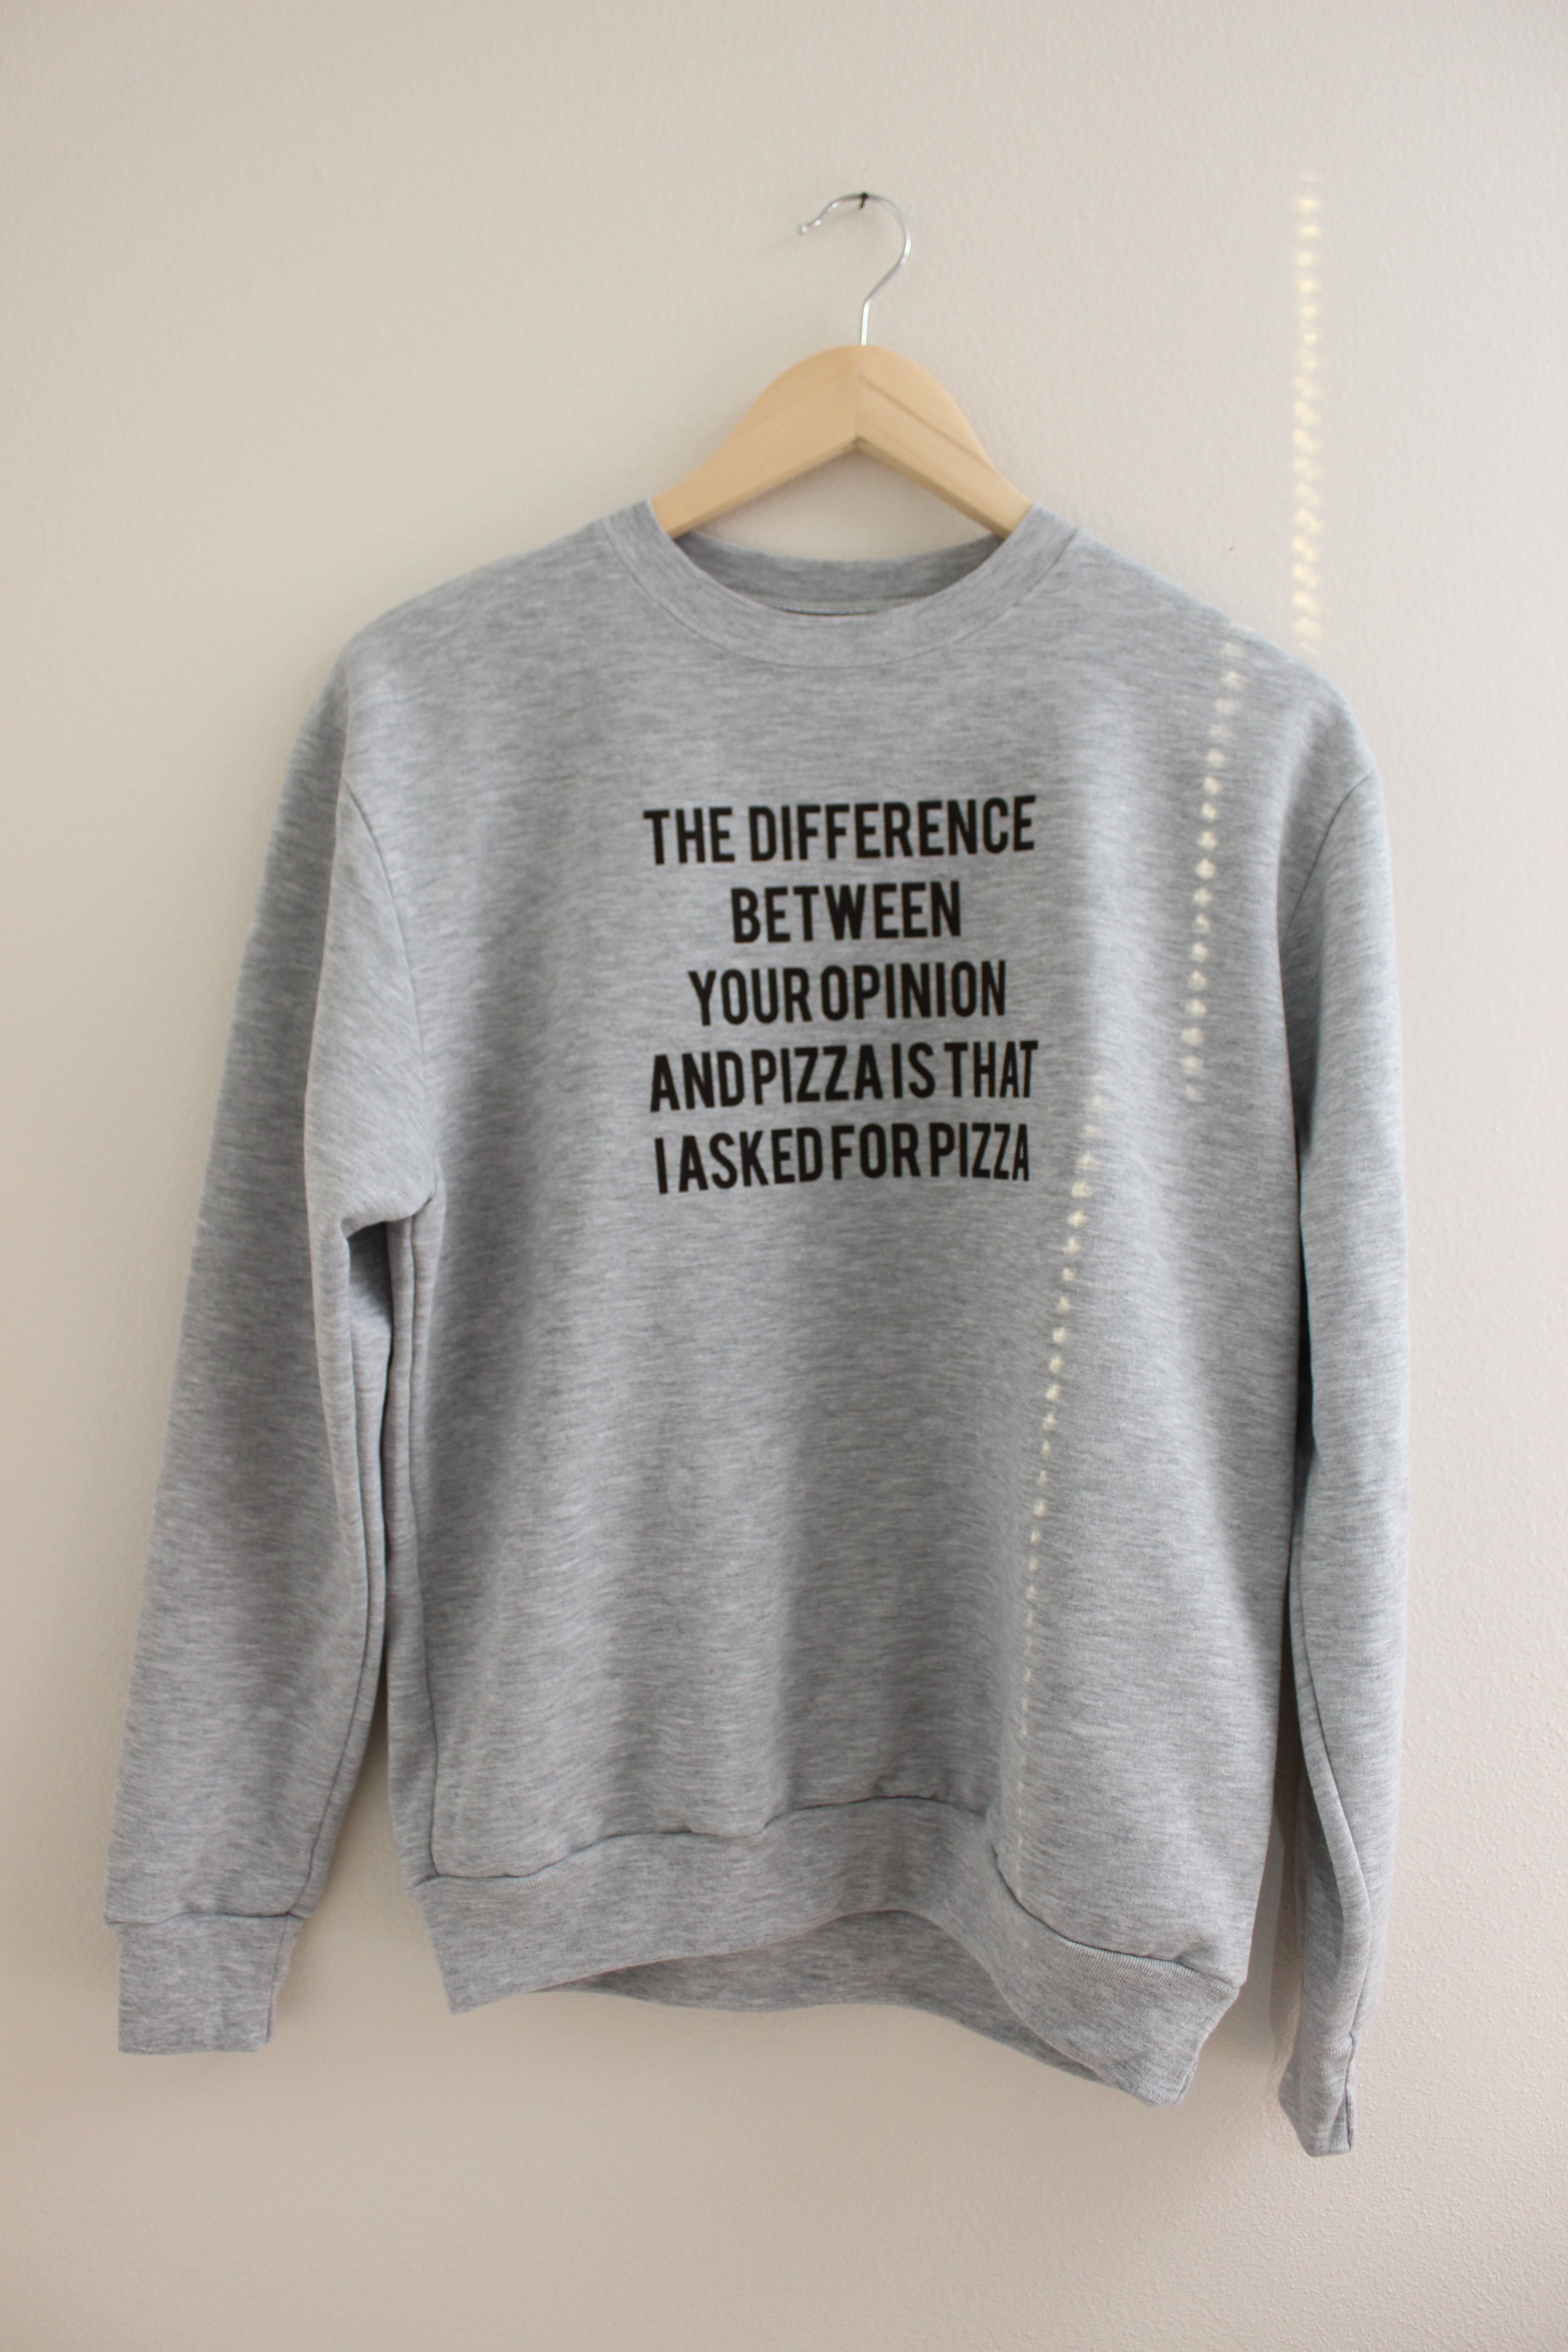 35 Sweater Available On Casesbyoliviarose Com Grey Crewneck Sweatshirts Crew Neck Sweatshirt [ 5184 x 3456 Pixel ]